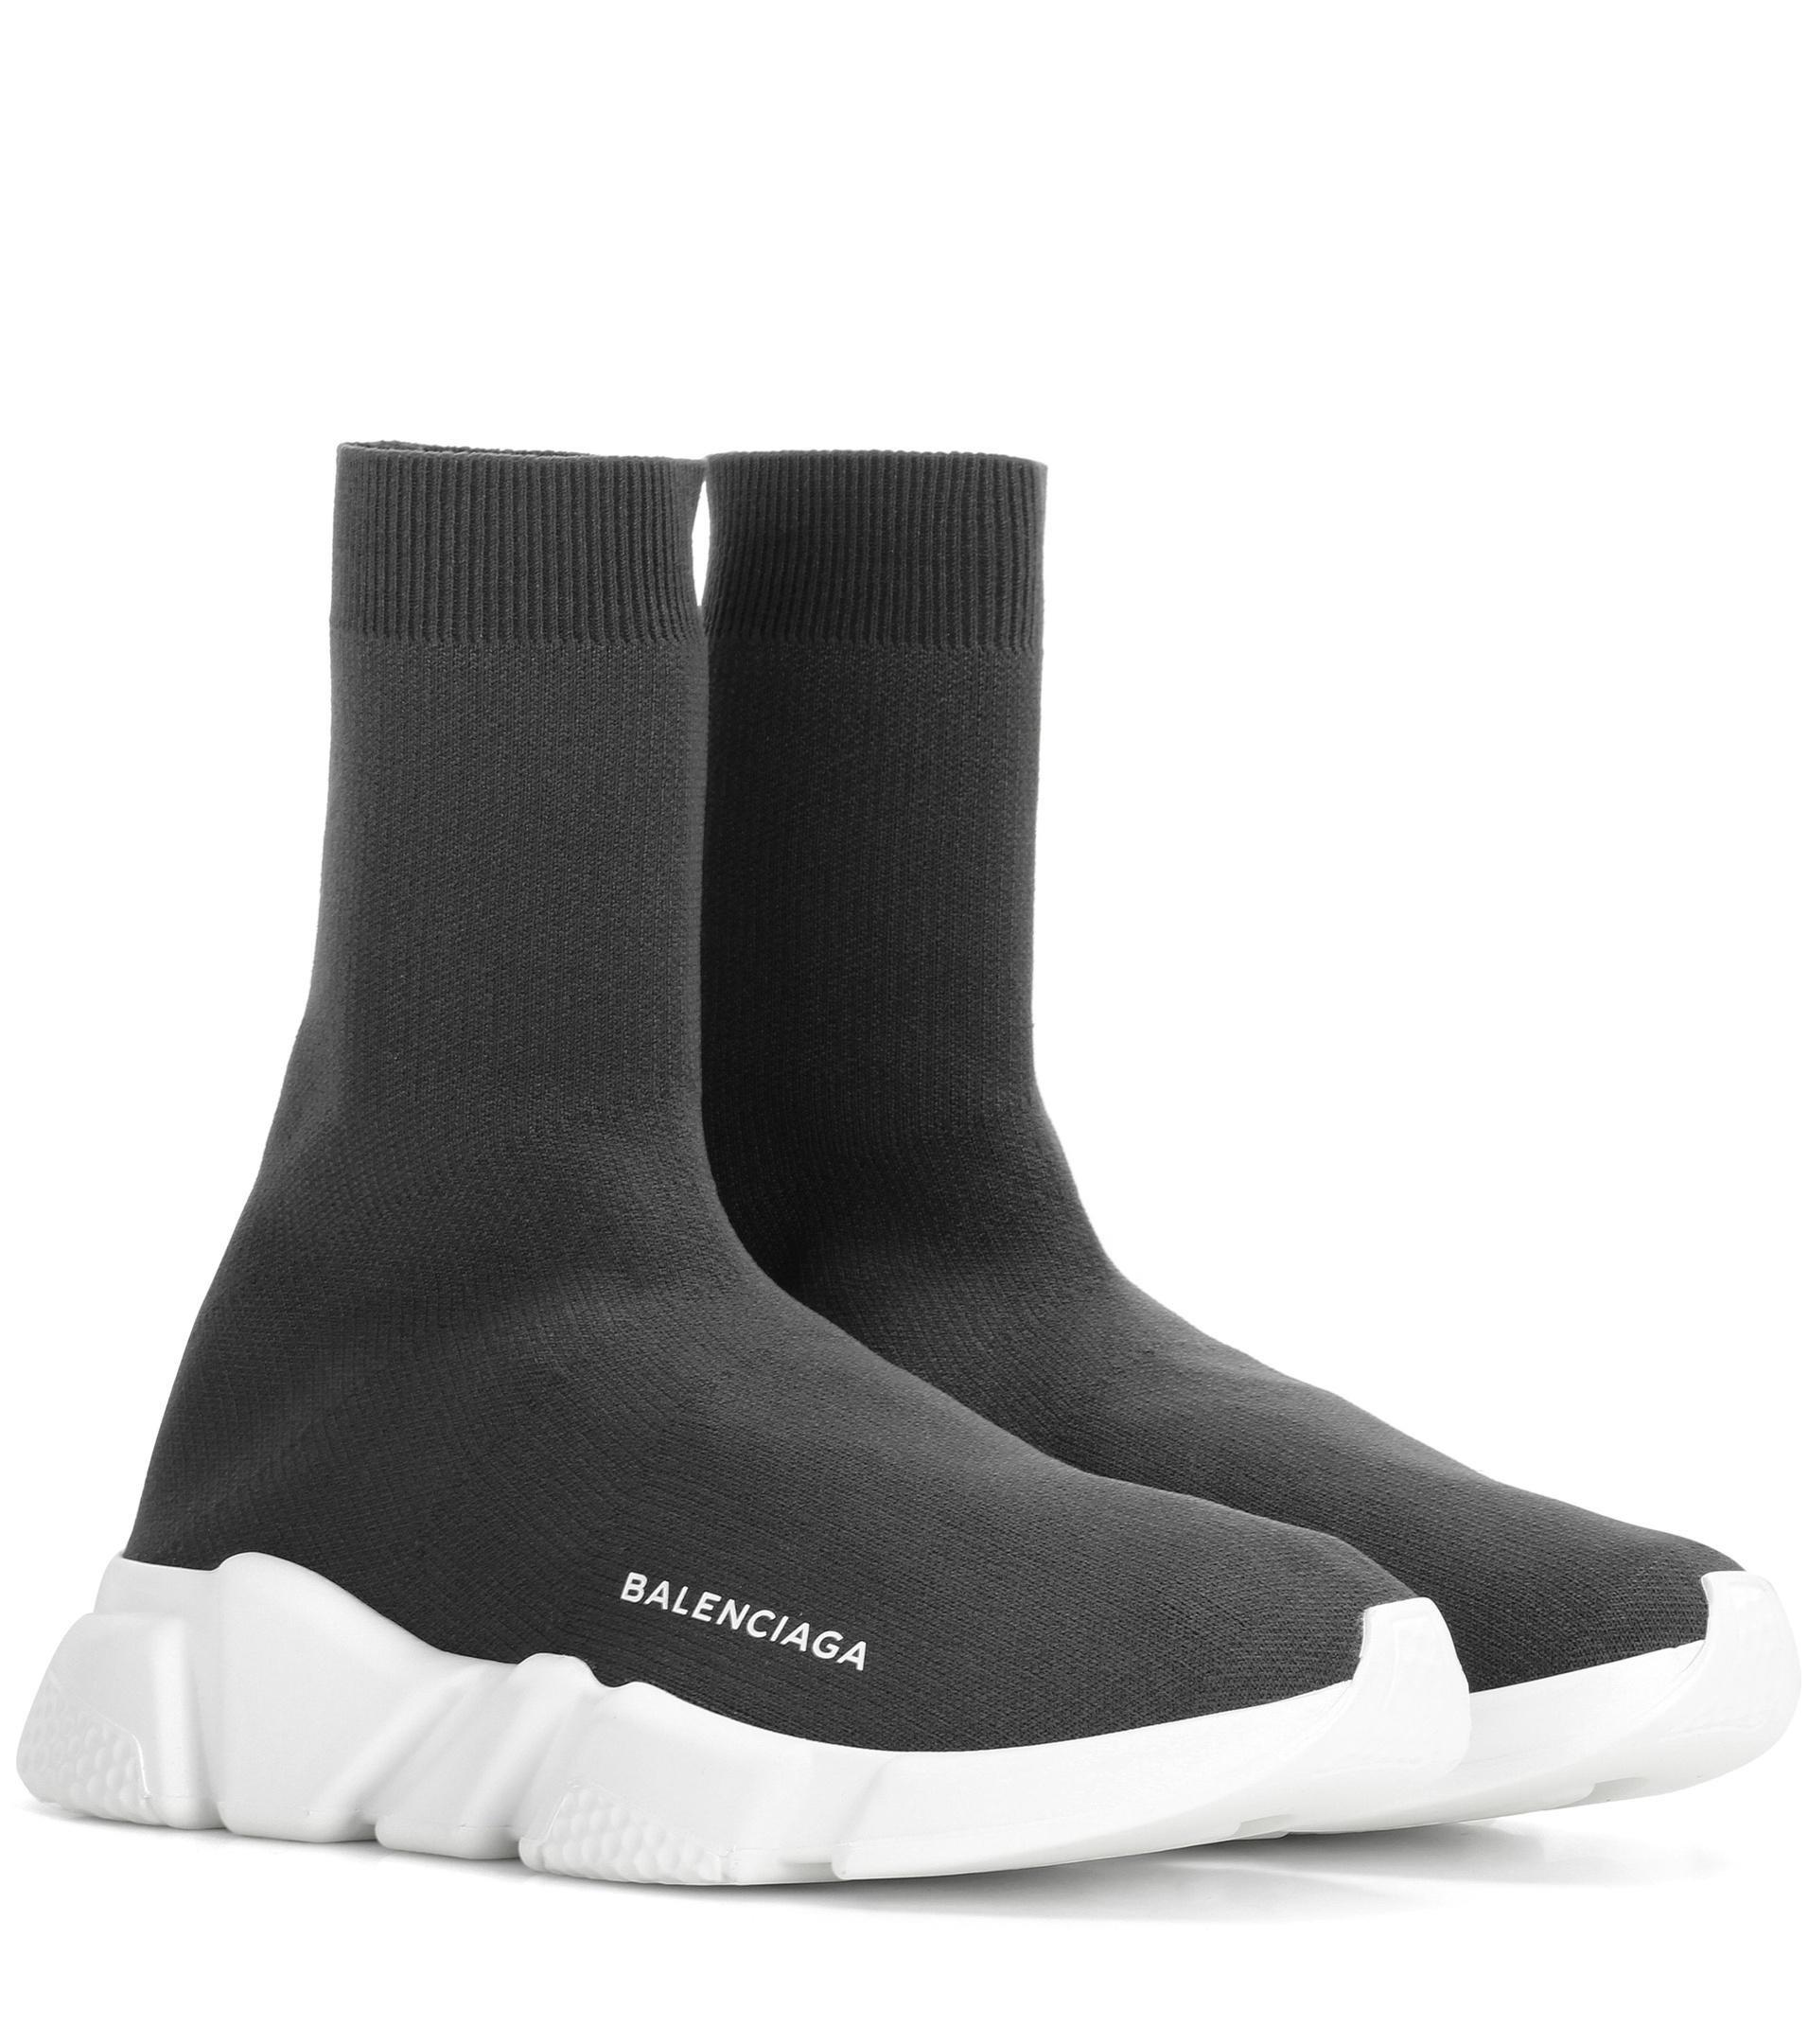 Lyst - Balenciaga Speed Sneakers in Gray 5d27022fef